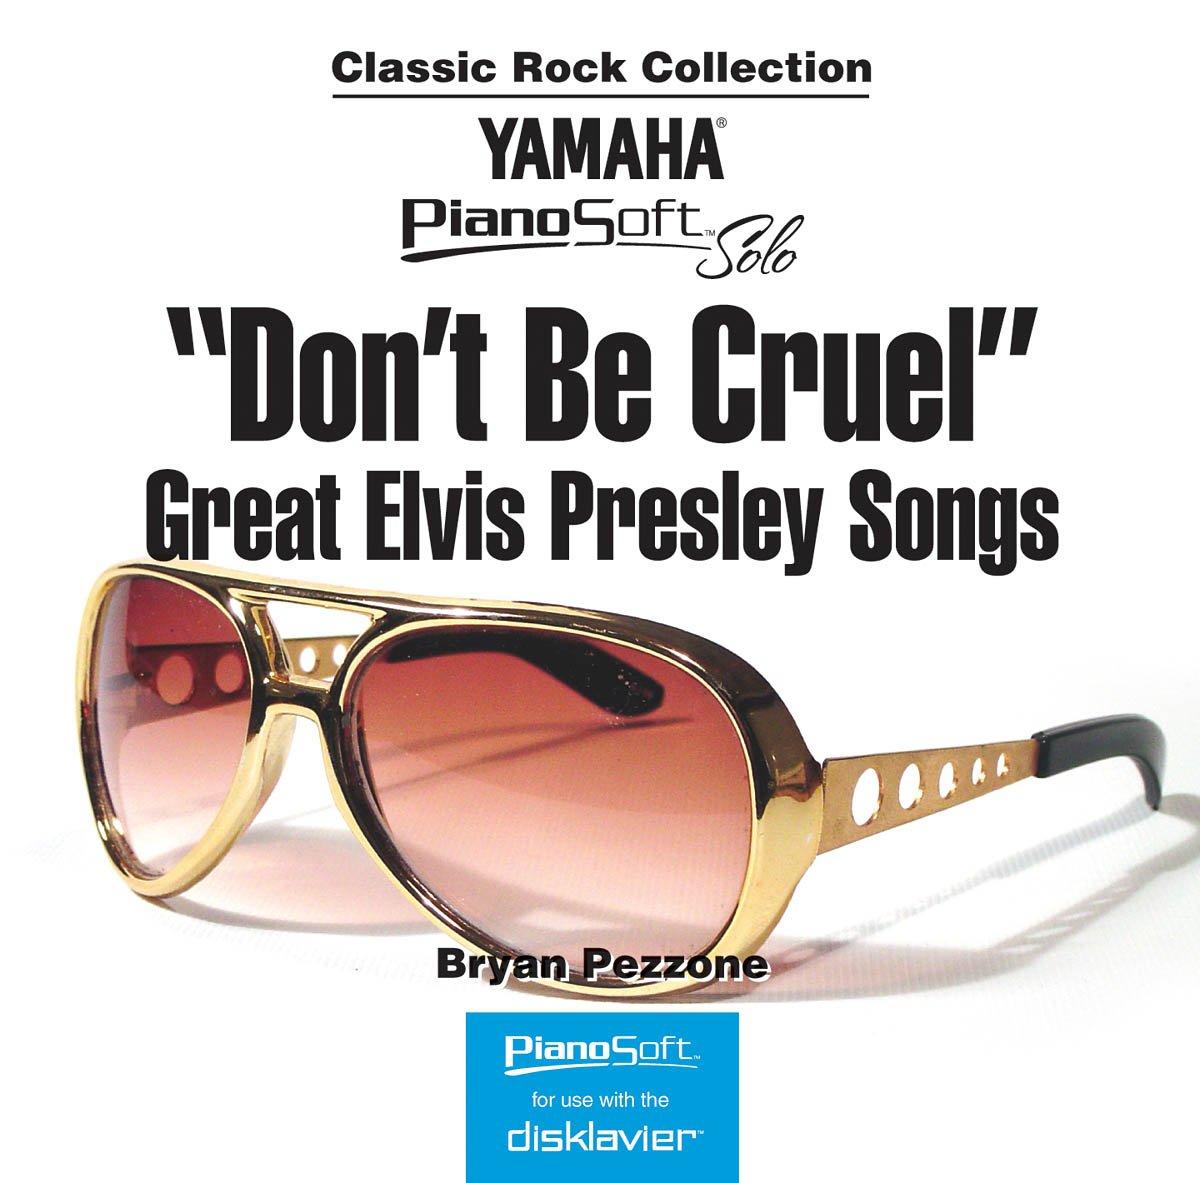 Don T Be Cruel Great Elvis Presley Songs 0884088199005 Books